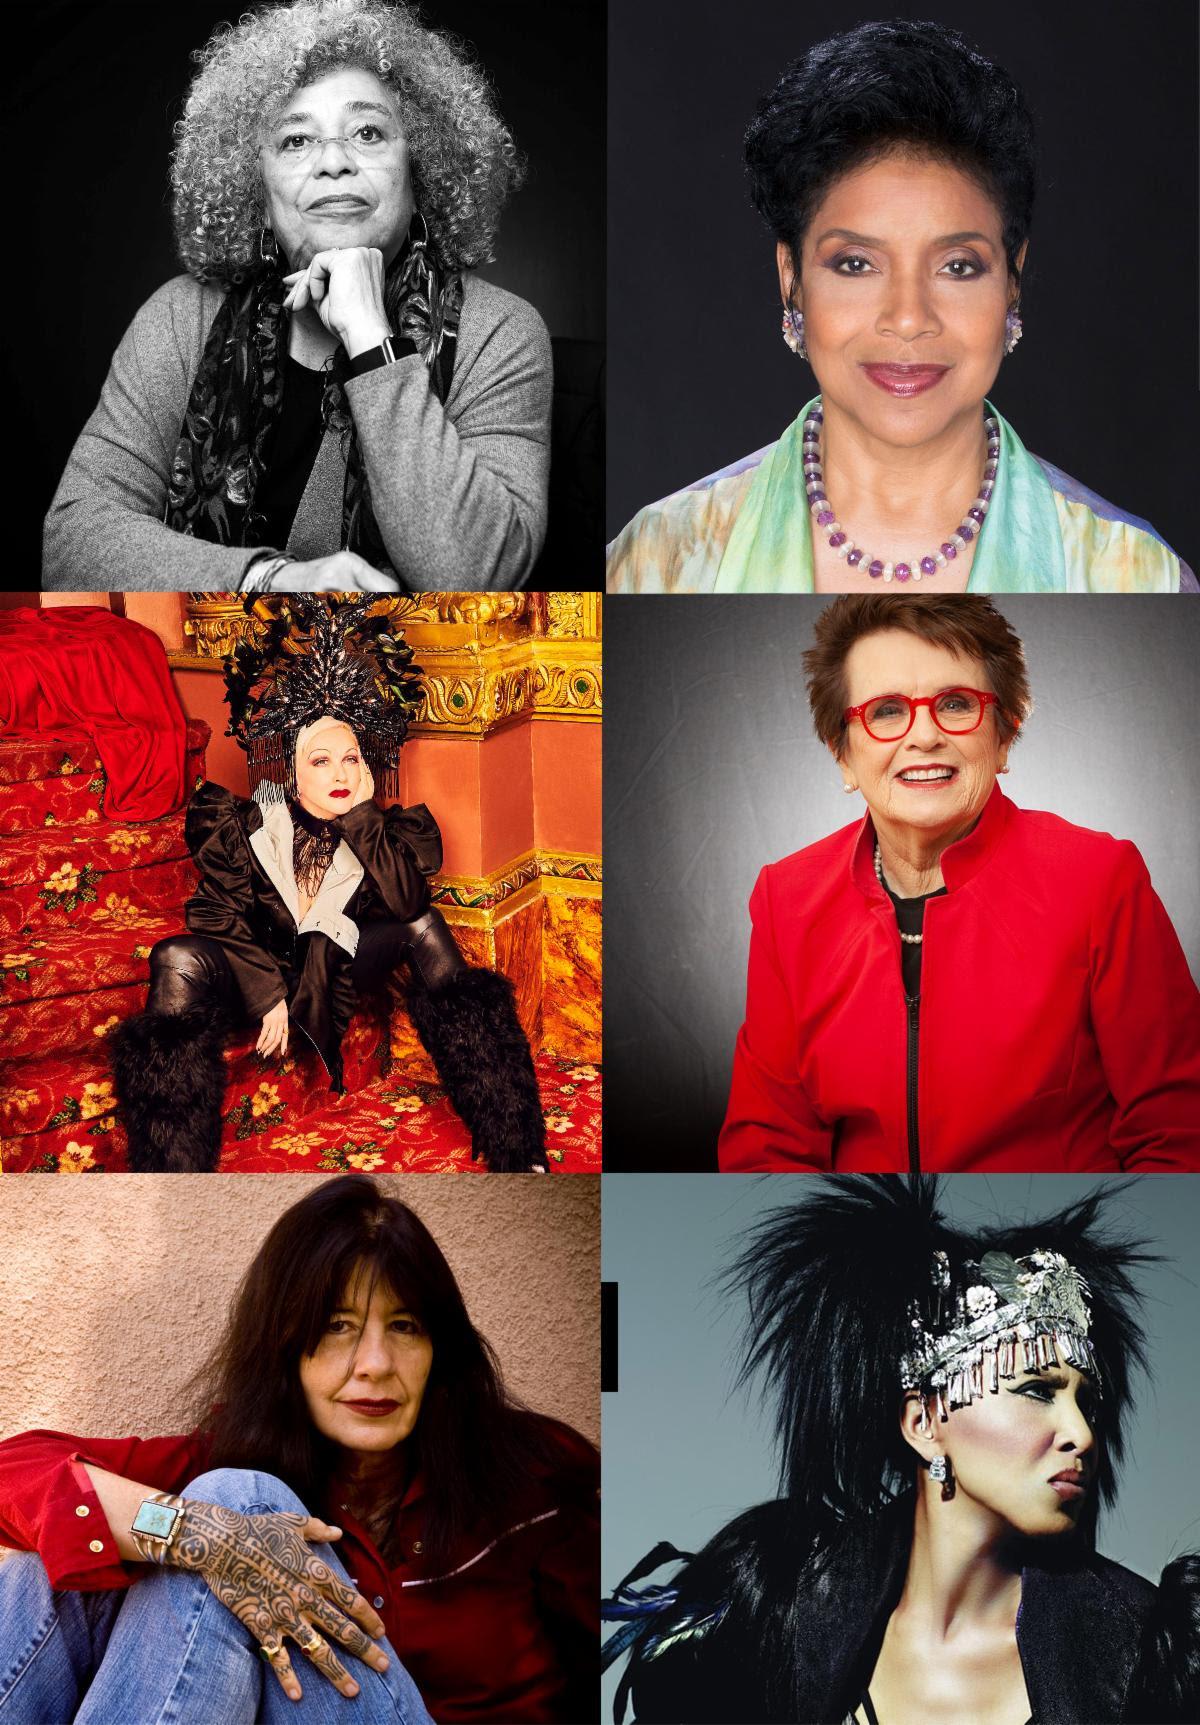 Cyndi Lauper, Phylicia Rashad, Billie Jean King, Joy Harjo Join Nona Hendryx and Angela Davis for 'Radical Healing' on August 14